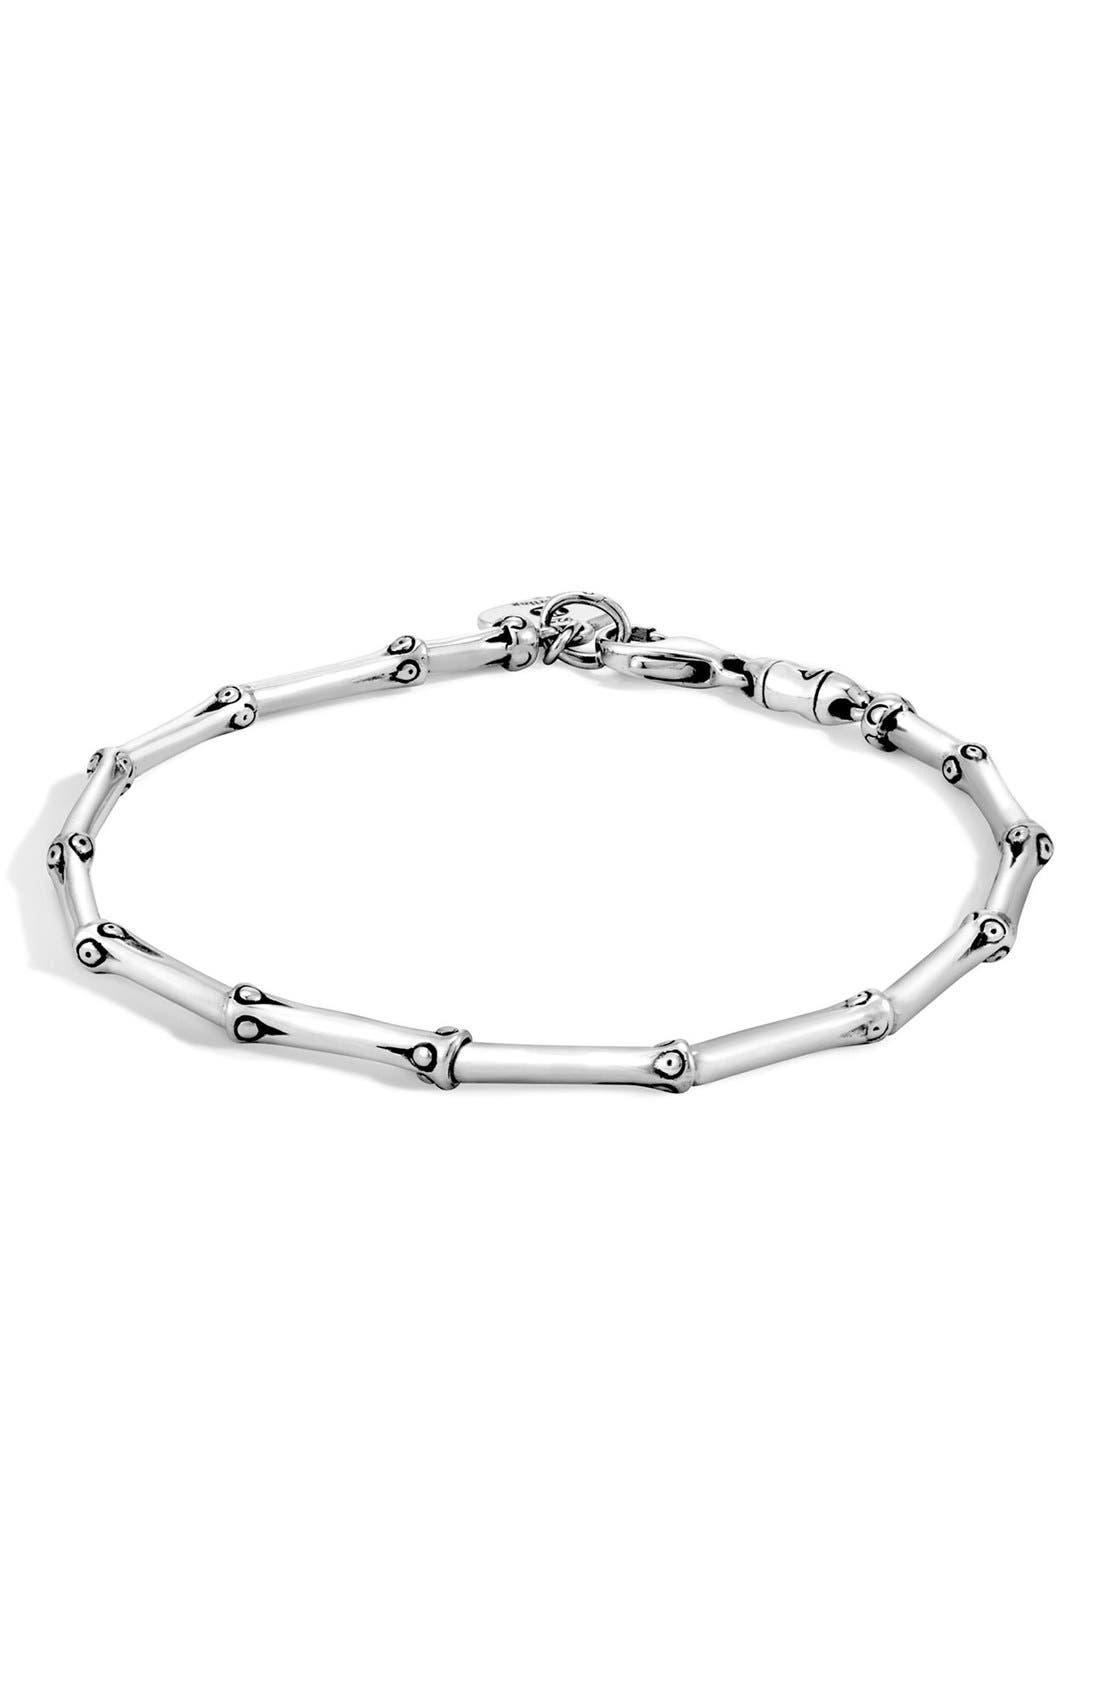 John Hardy 'Bamboo' Bracelet